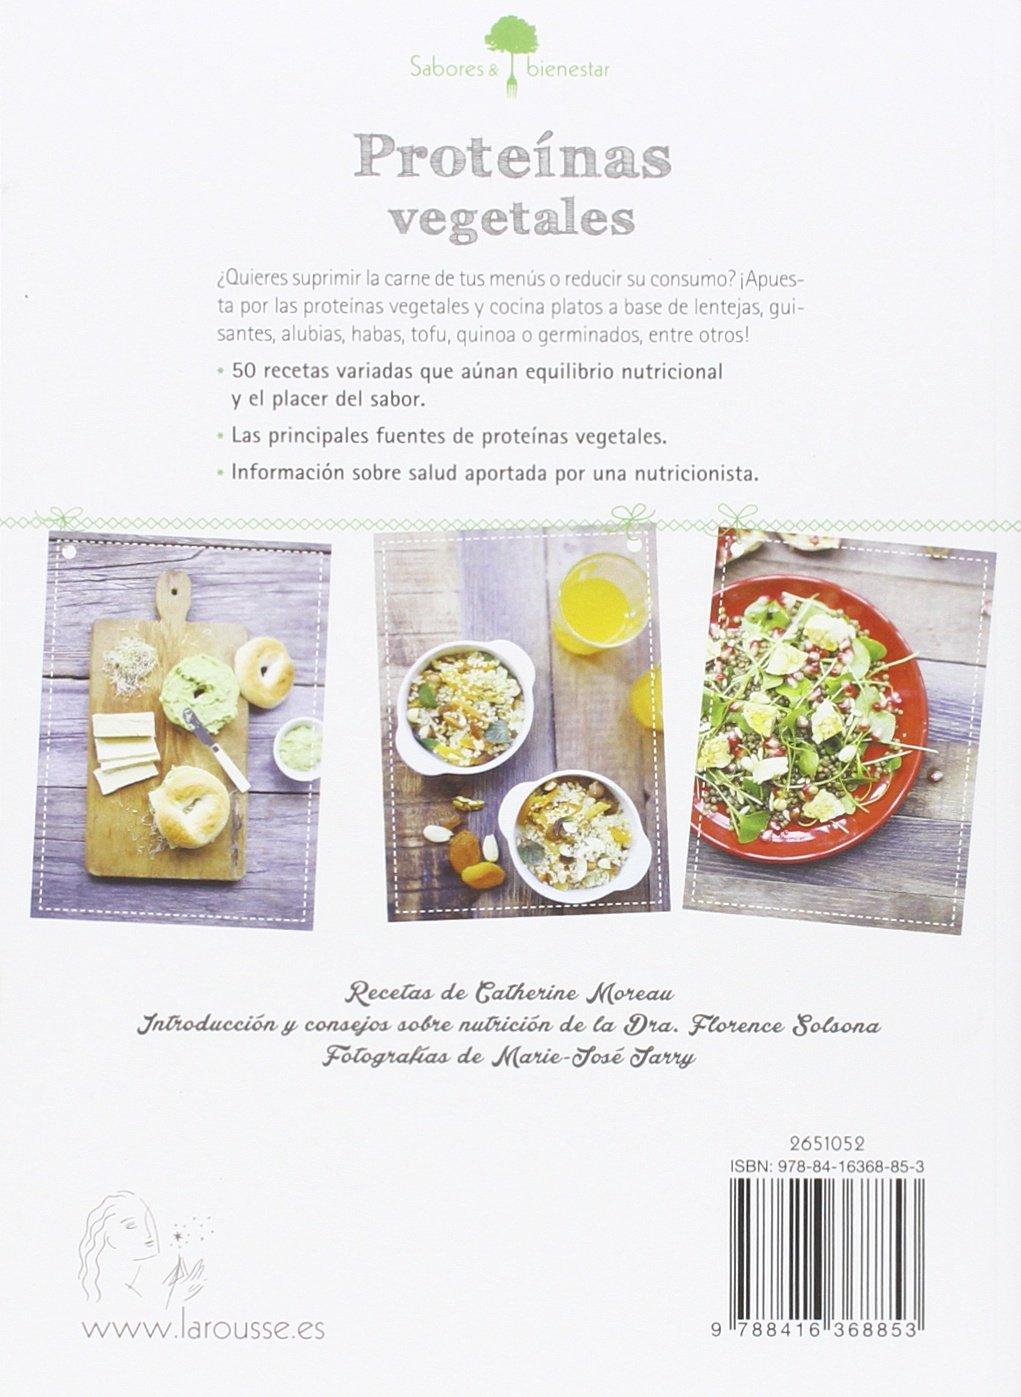 Sabores & Bienestar: Proteínas vegetales Larousse - Libros ...